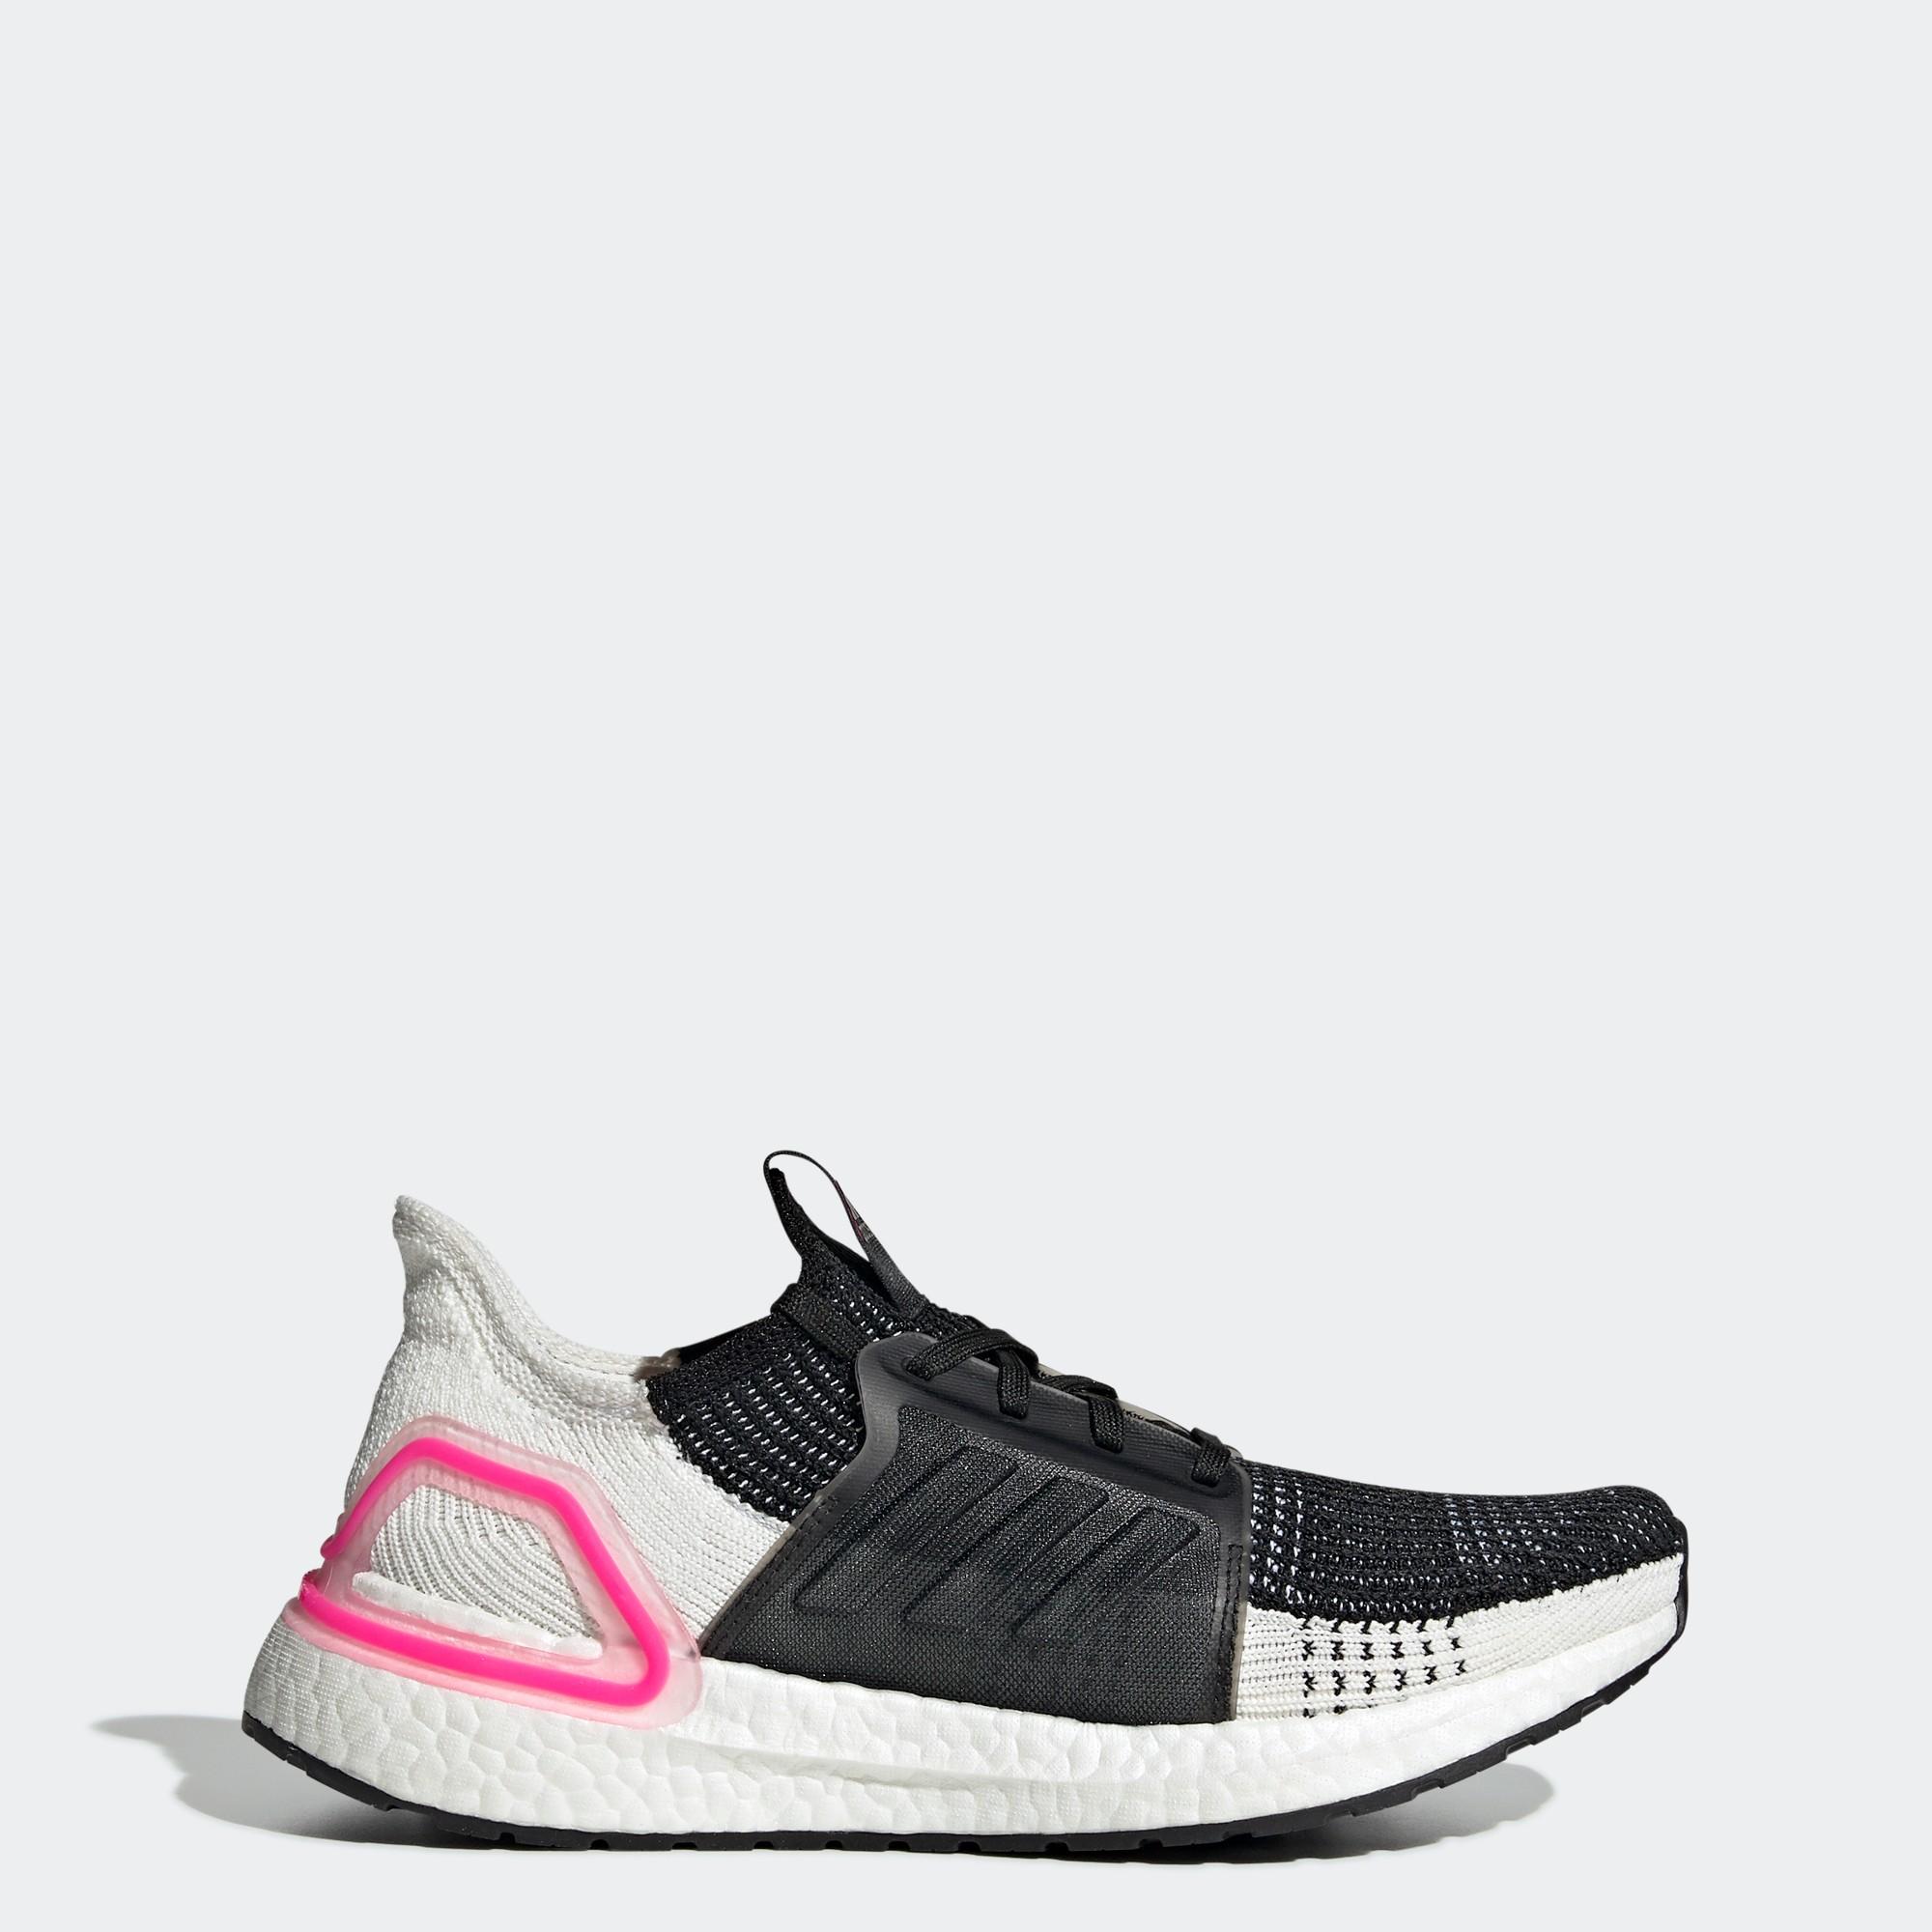 adidas price list